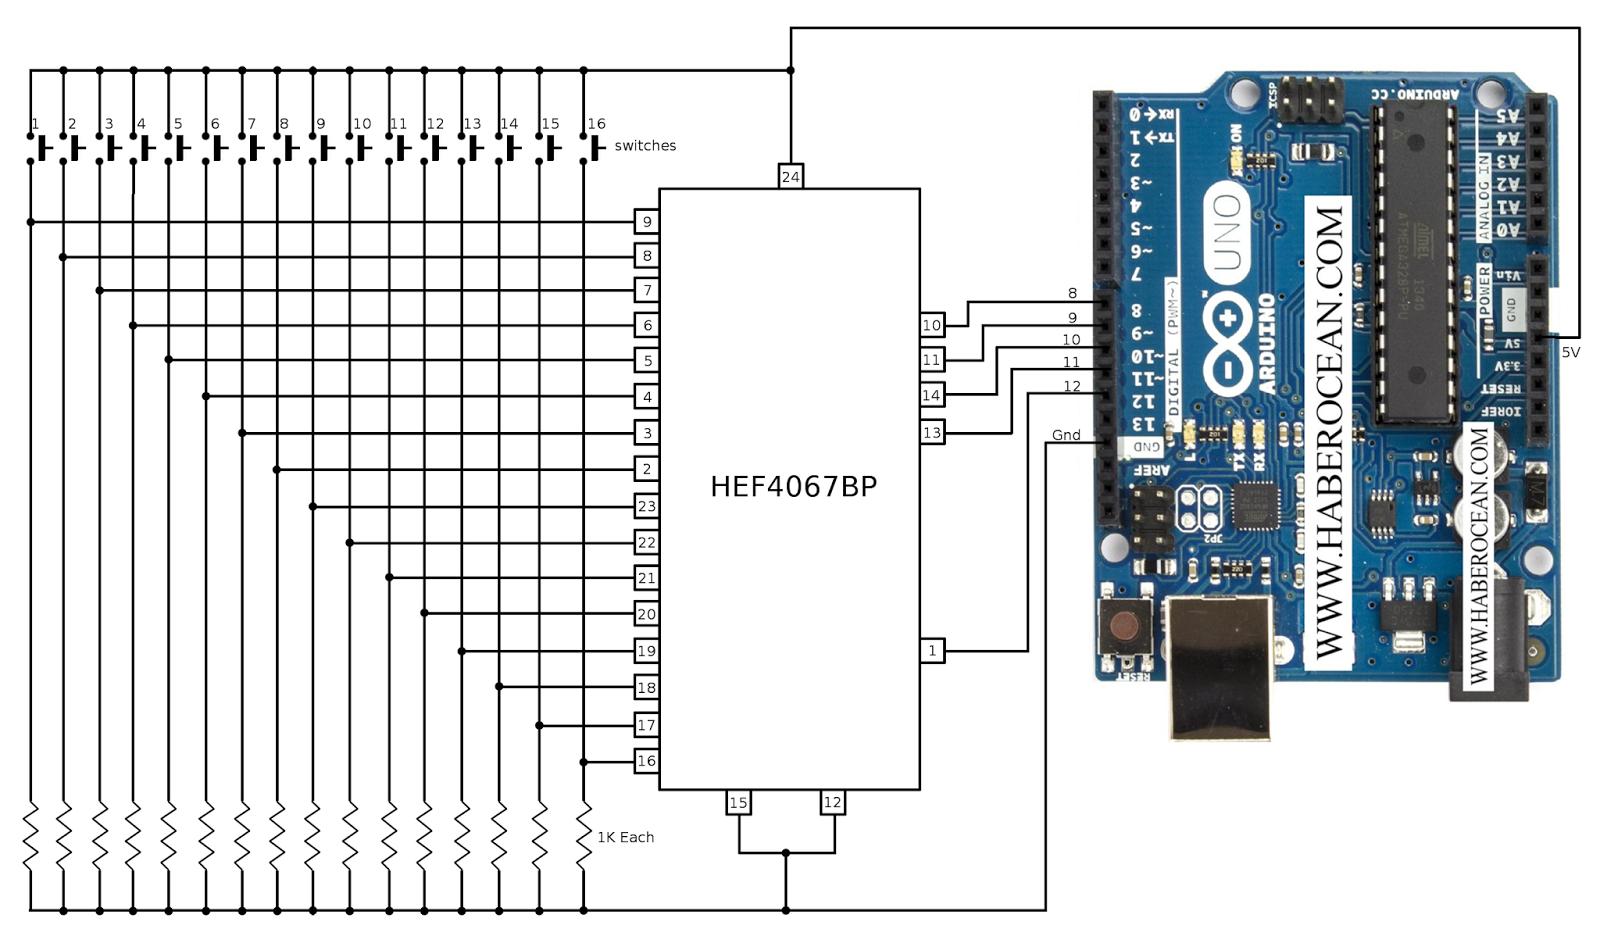 Circuit To Interface Hef4067bp Arduino How Use 4067 Water Level Indicator Gadgetronicx Multiplexer Or Demultiplexer Mux Demux Tutorial